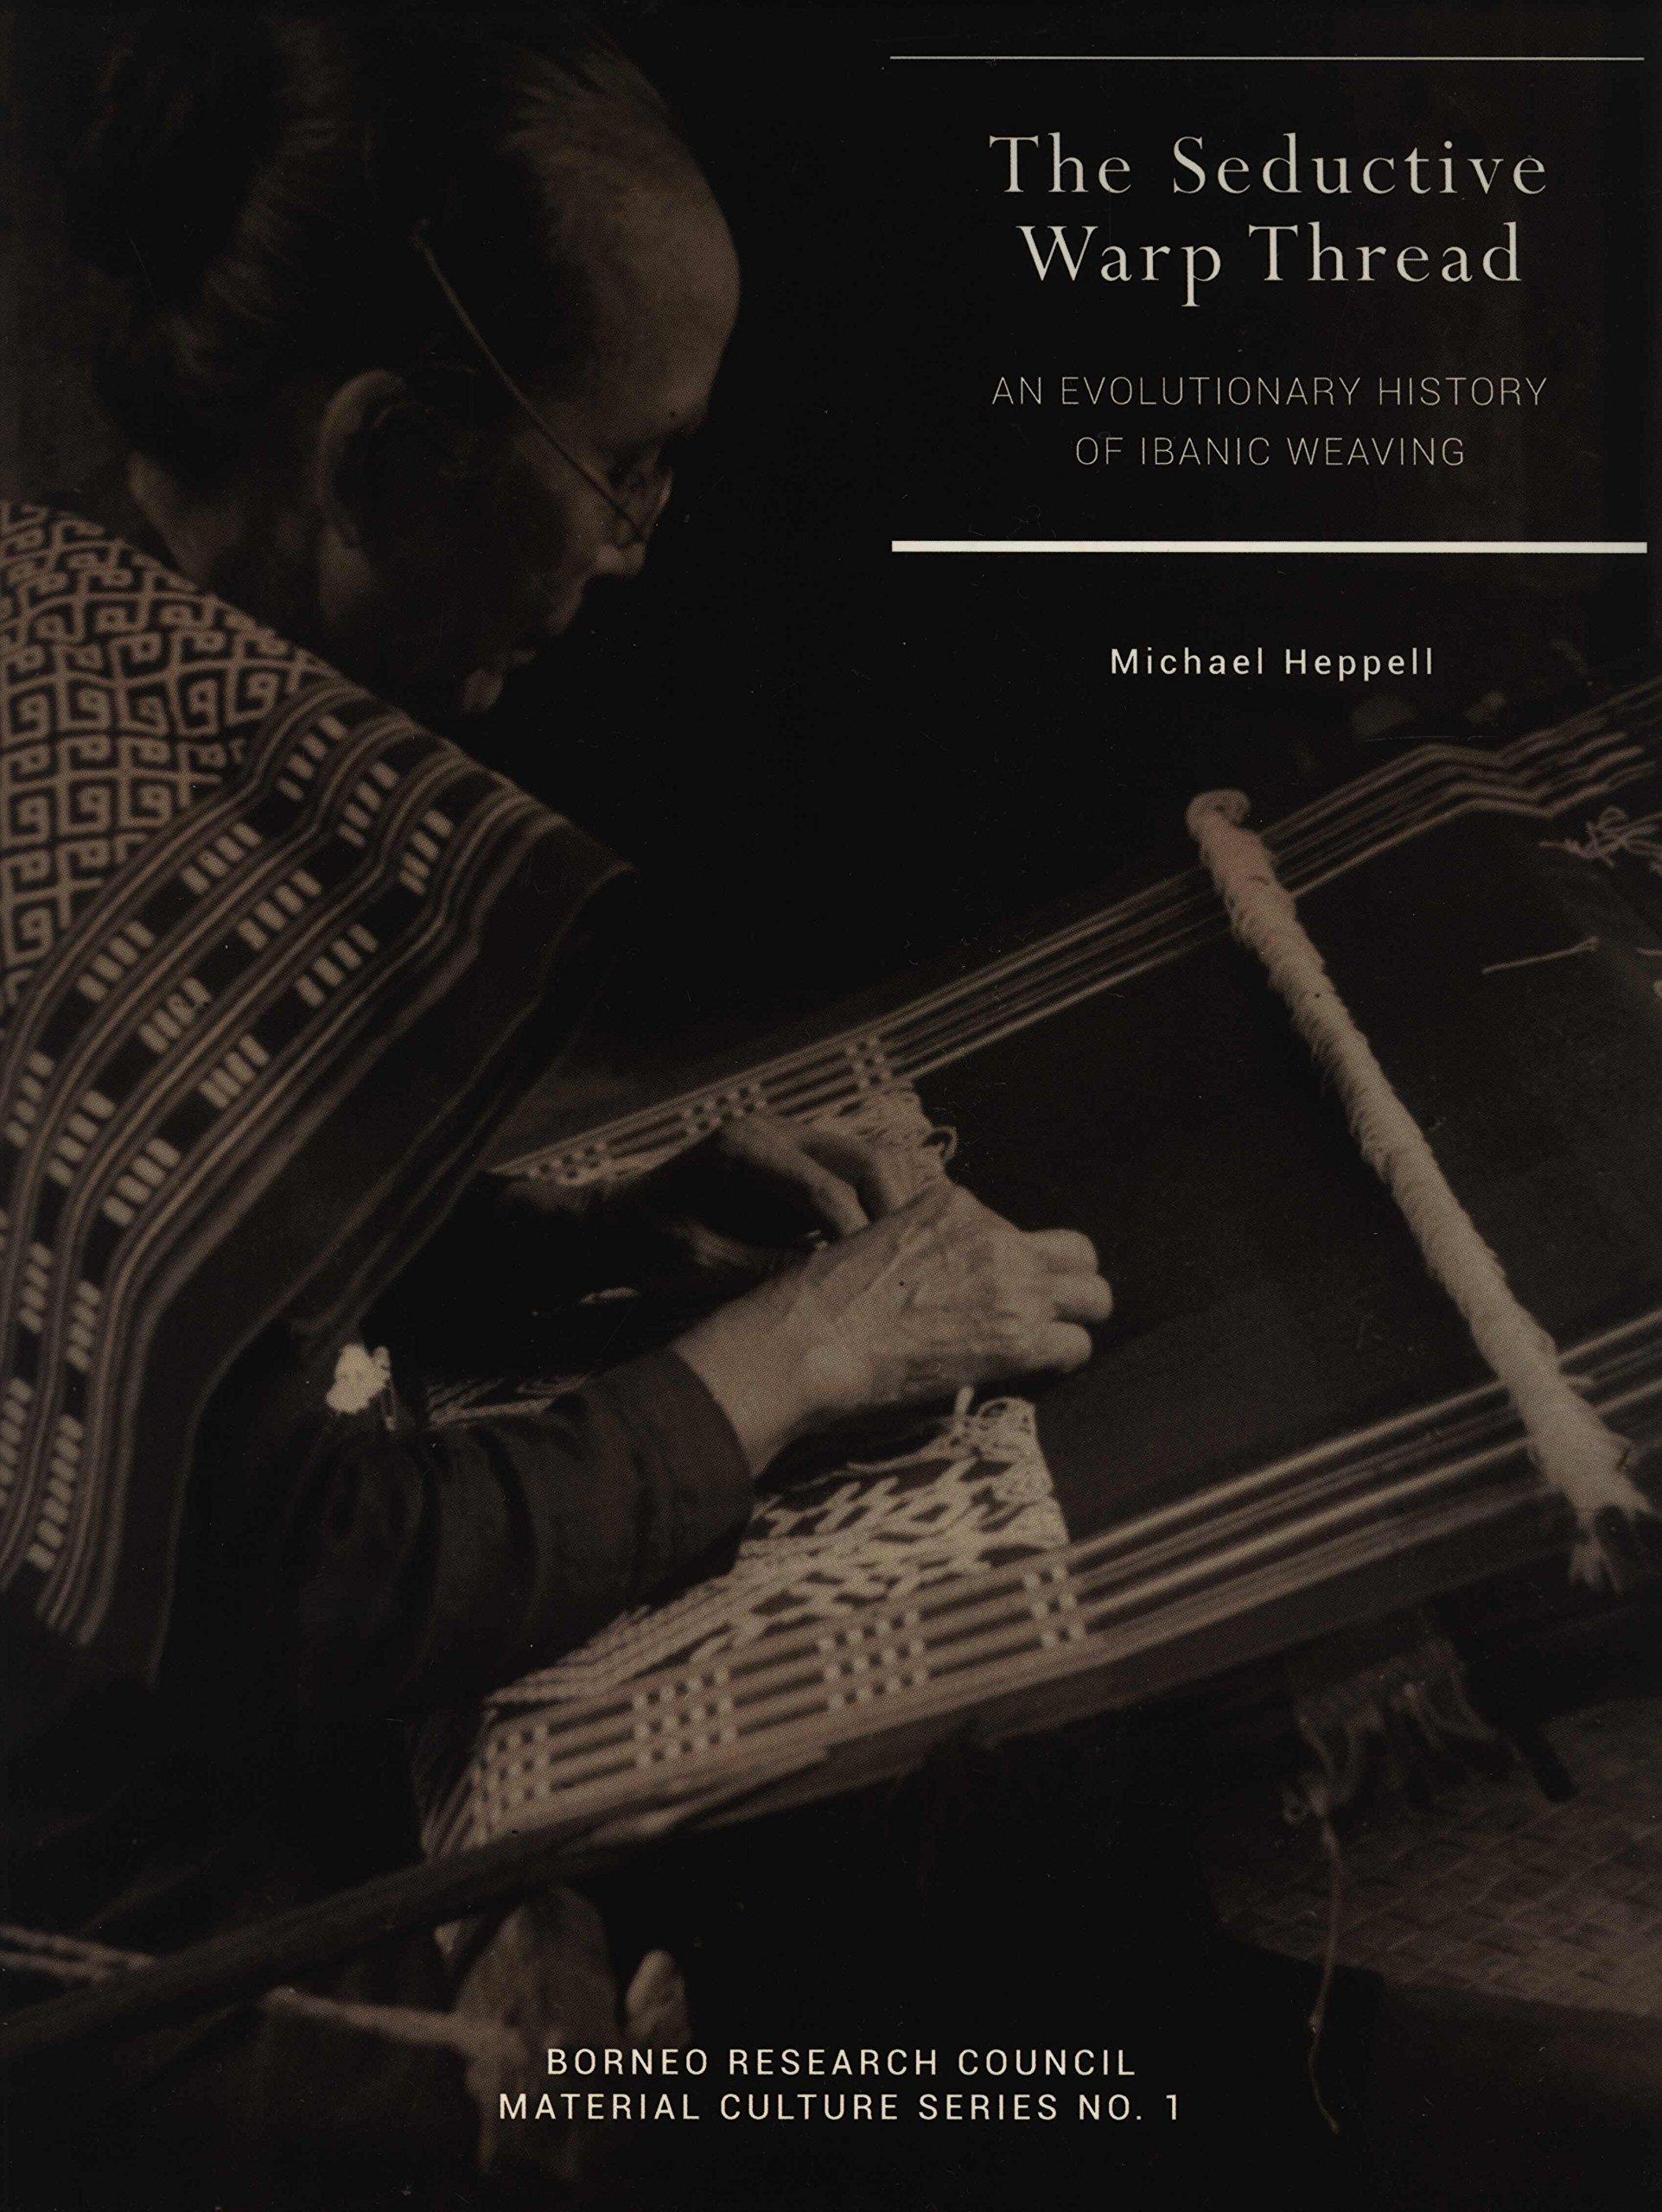 The Seductive Warp Thread: An Evolutionary History of Ibanic Weaving Michael Heppell